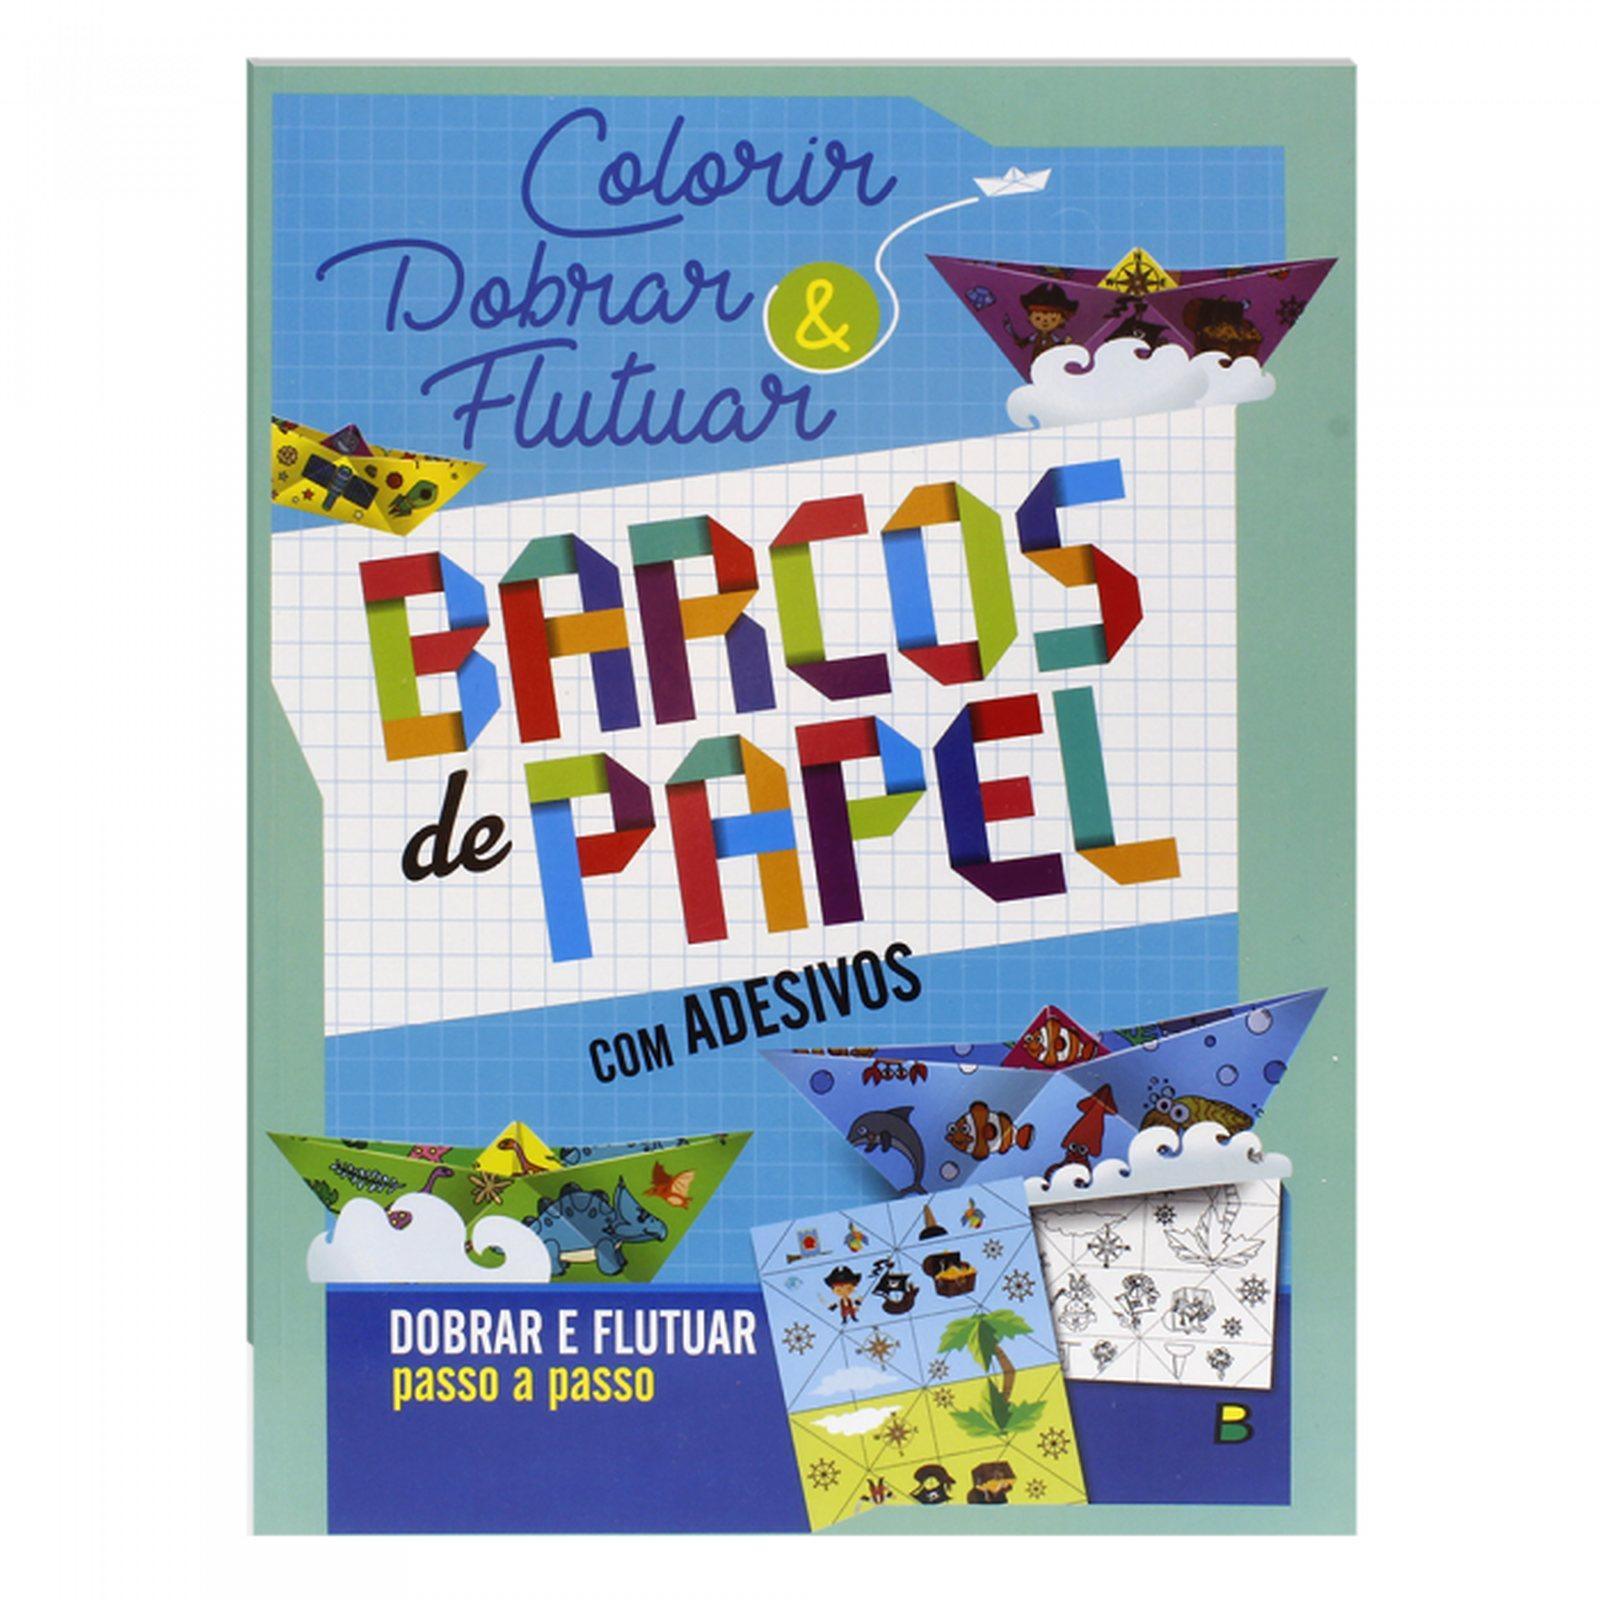 Colorir e Dobrar: Barcos de Papel